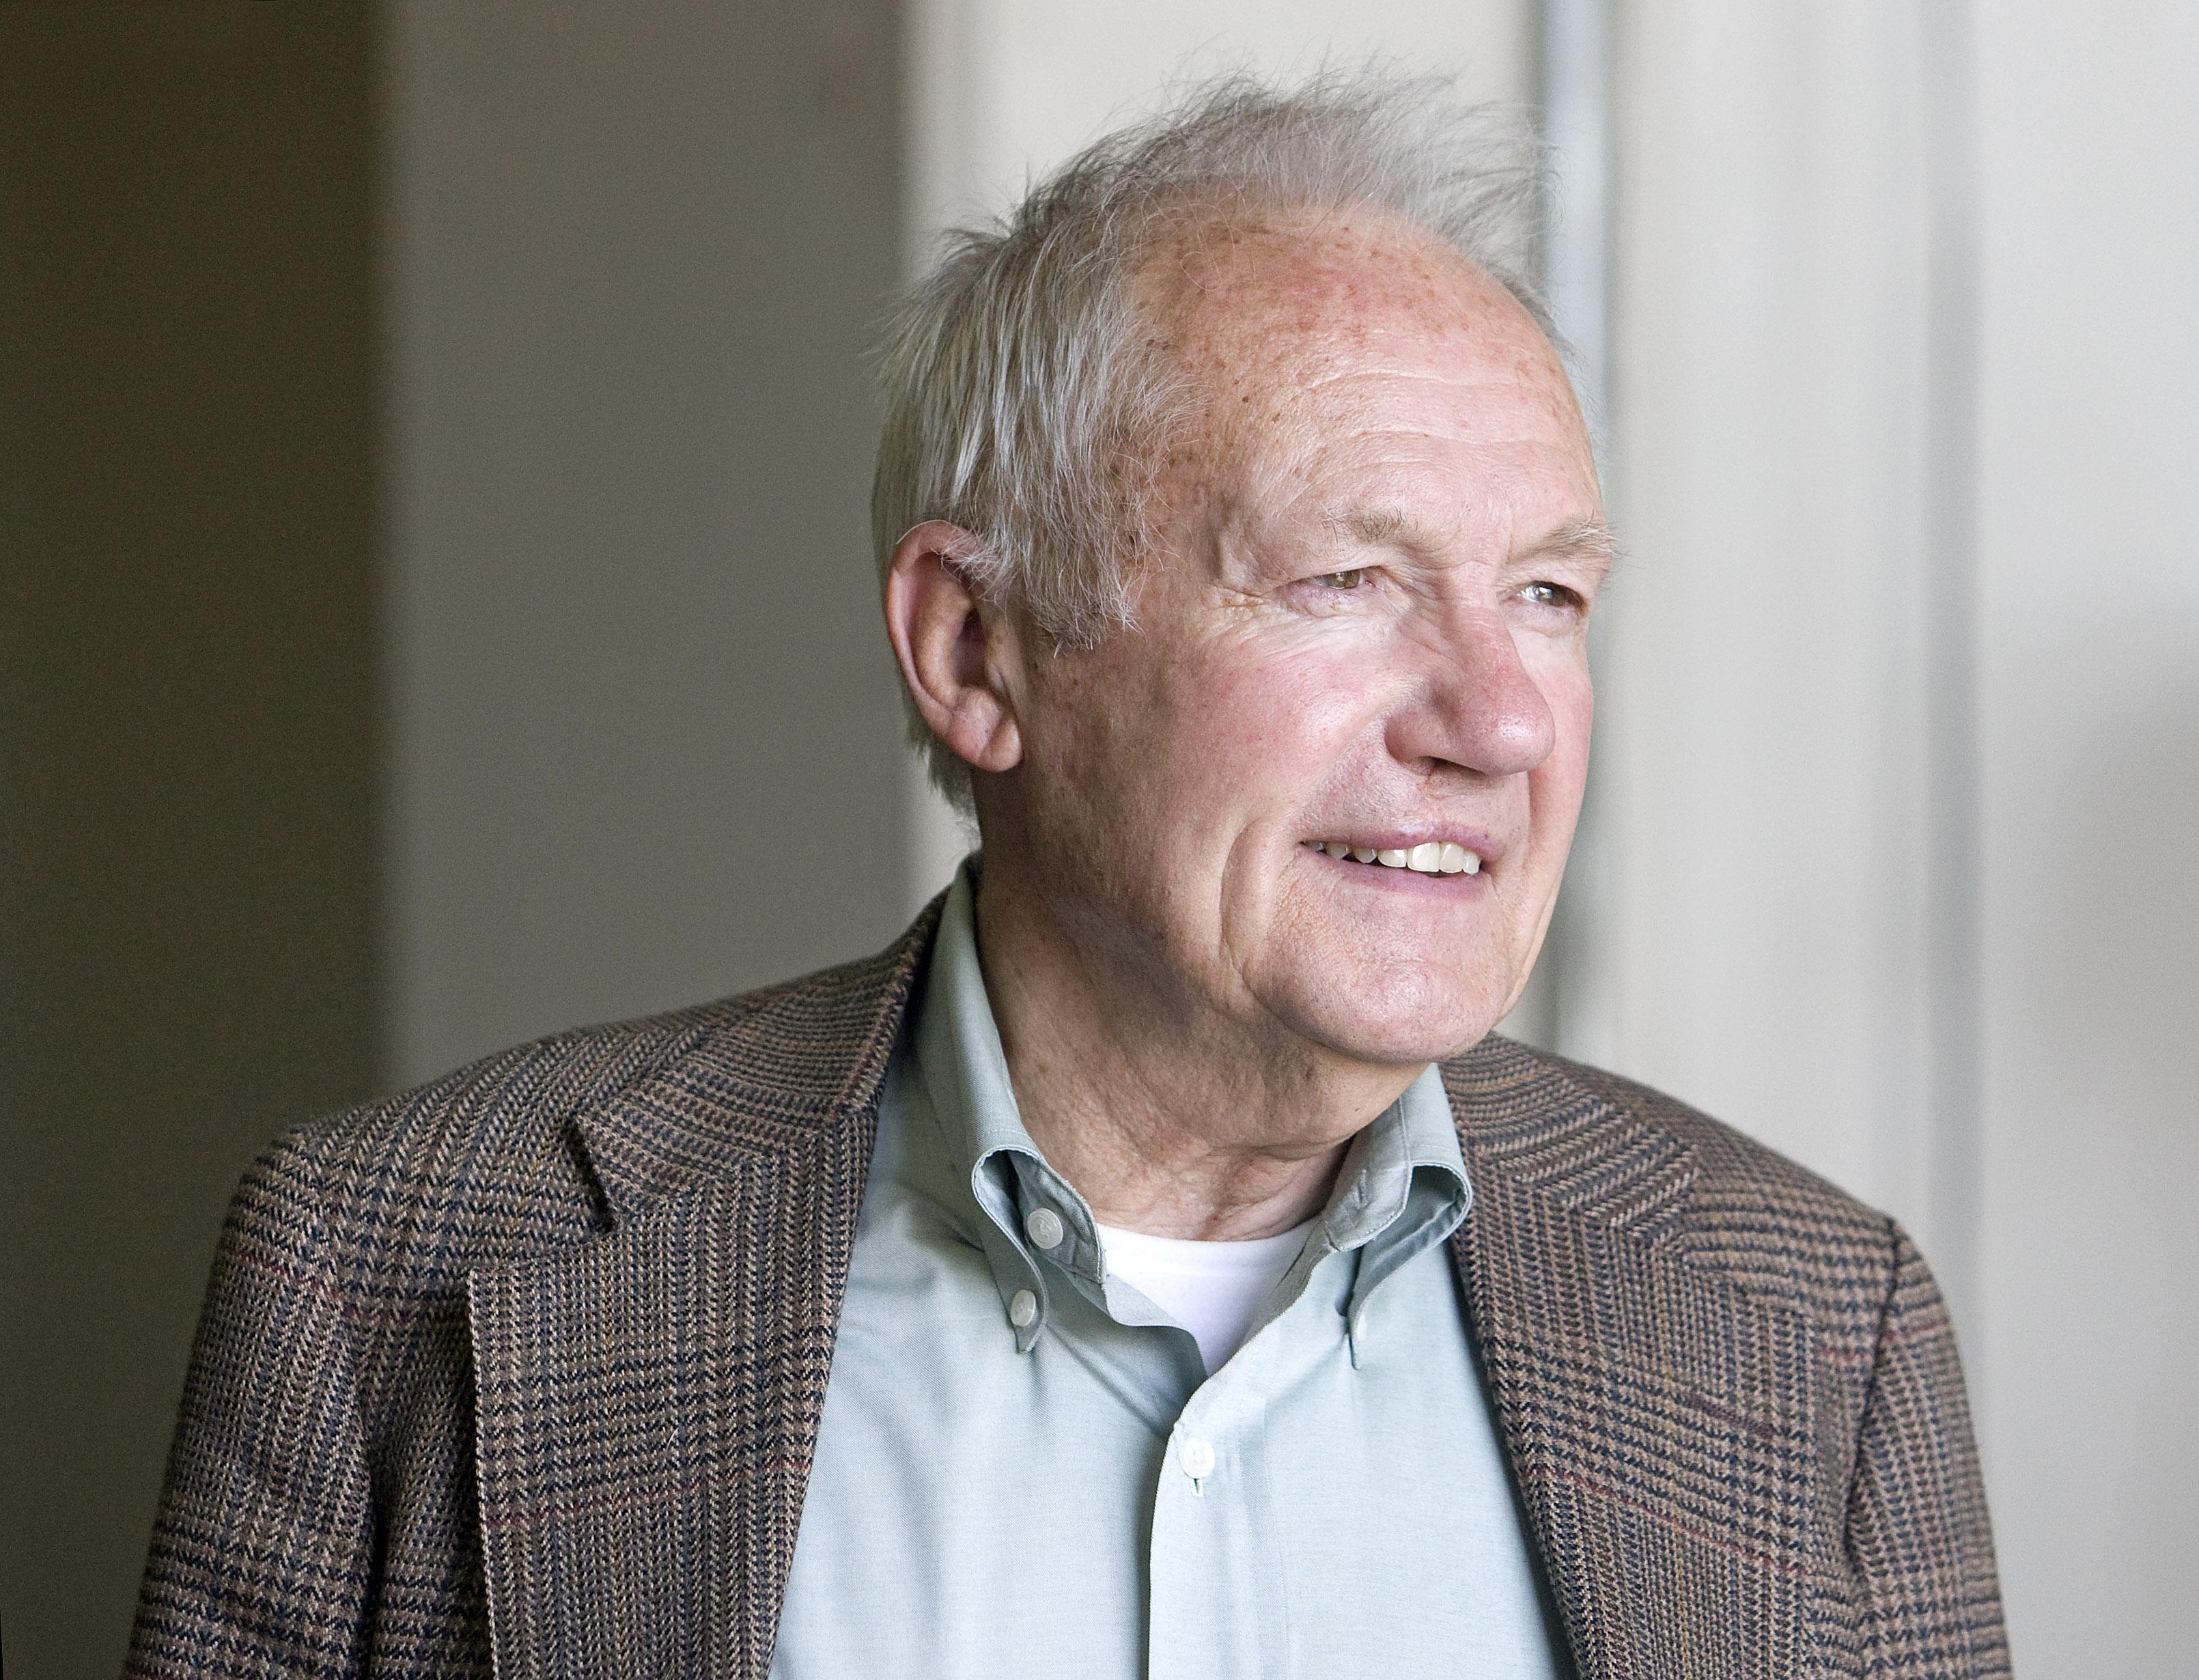 King T. Leatherbury in May 2010 (Barbara D. Livingston)